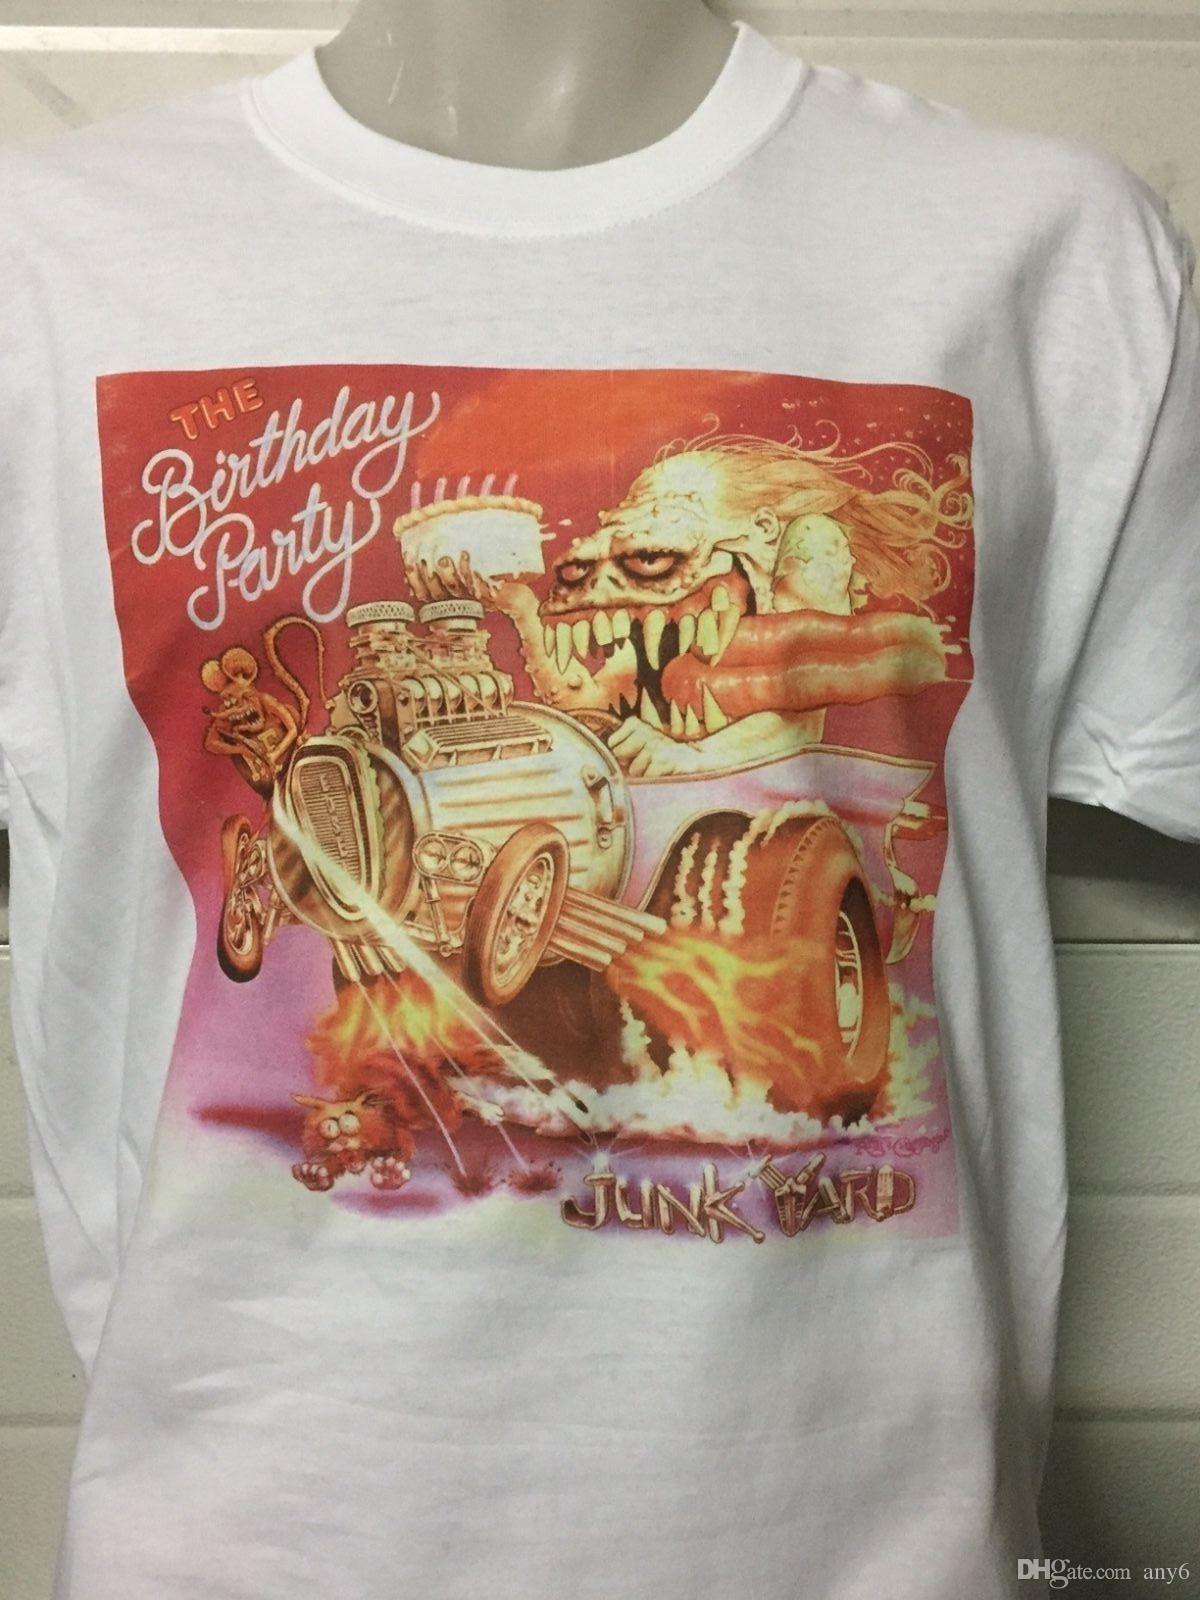 Cave Birthday Party Cattivi Nick Junkyard Semi I E T Shirt Acquista b7yIfvY6g